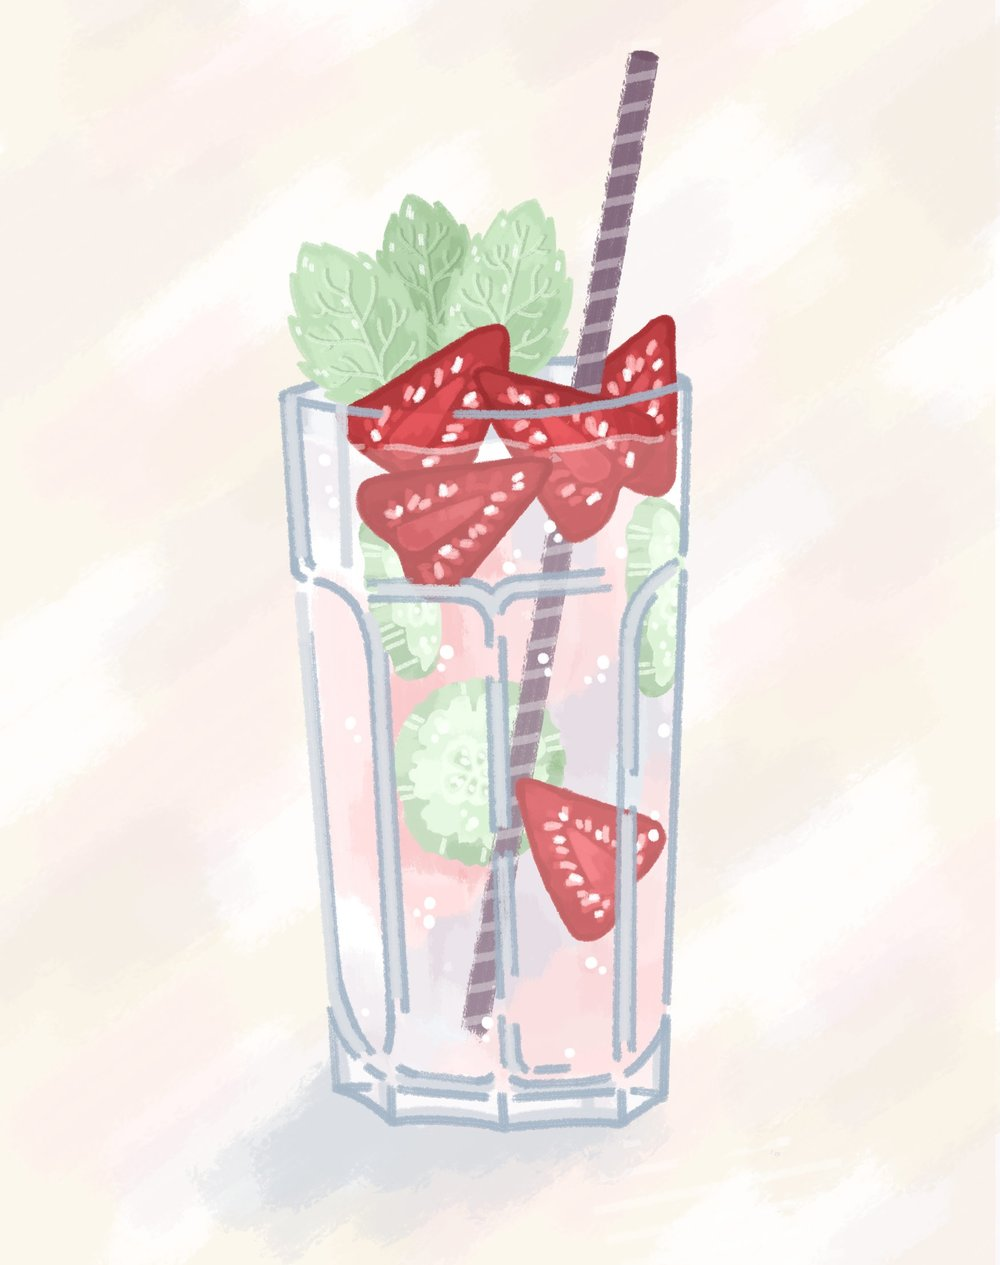 Pimms cocktail illustration.